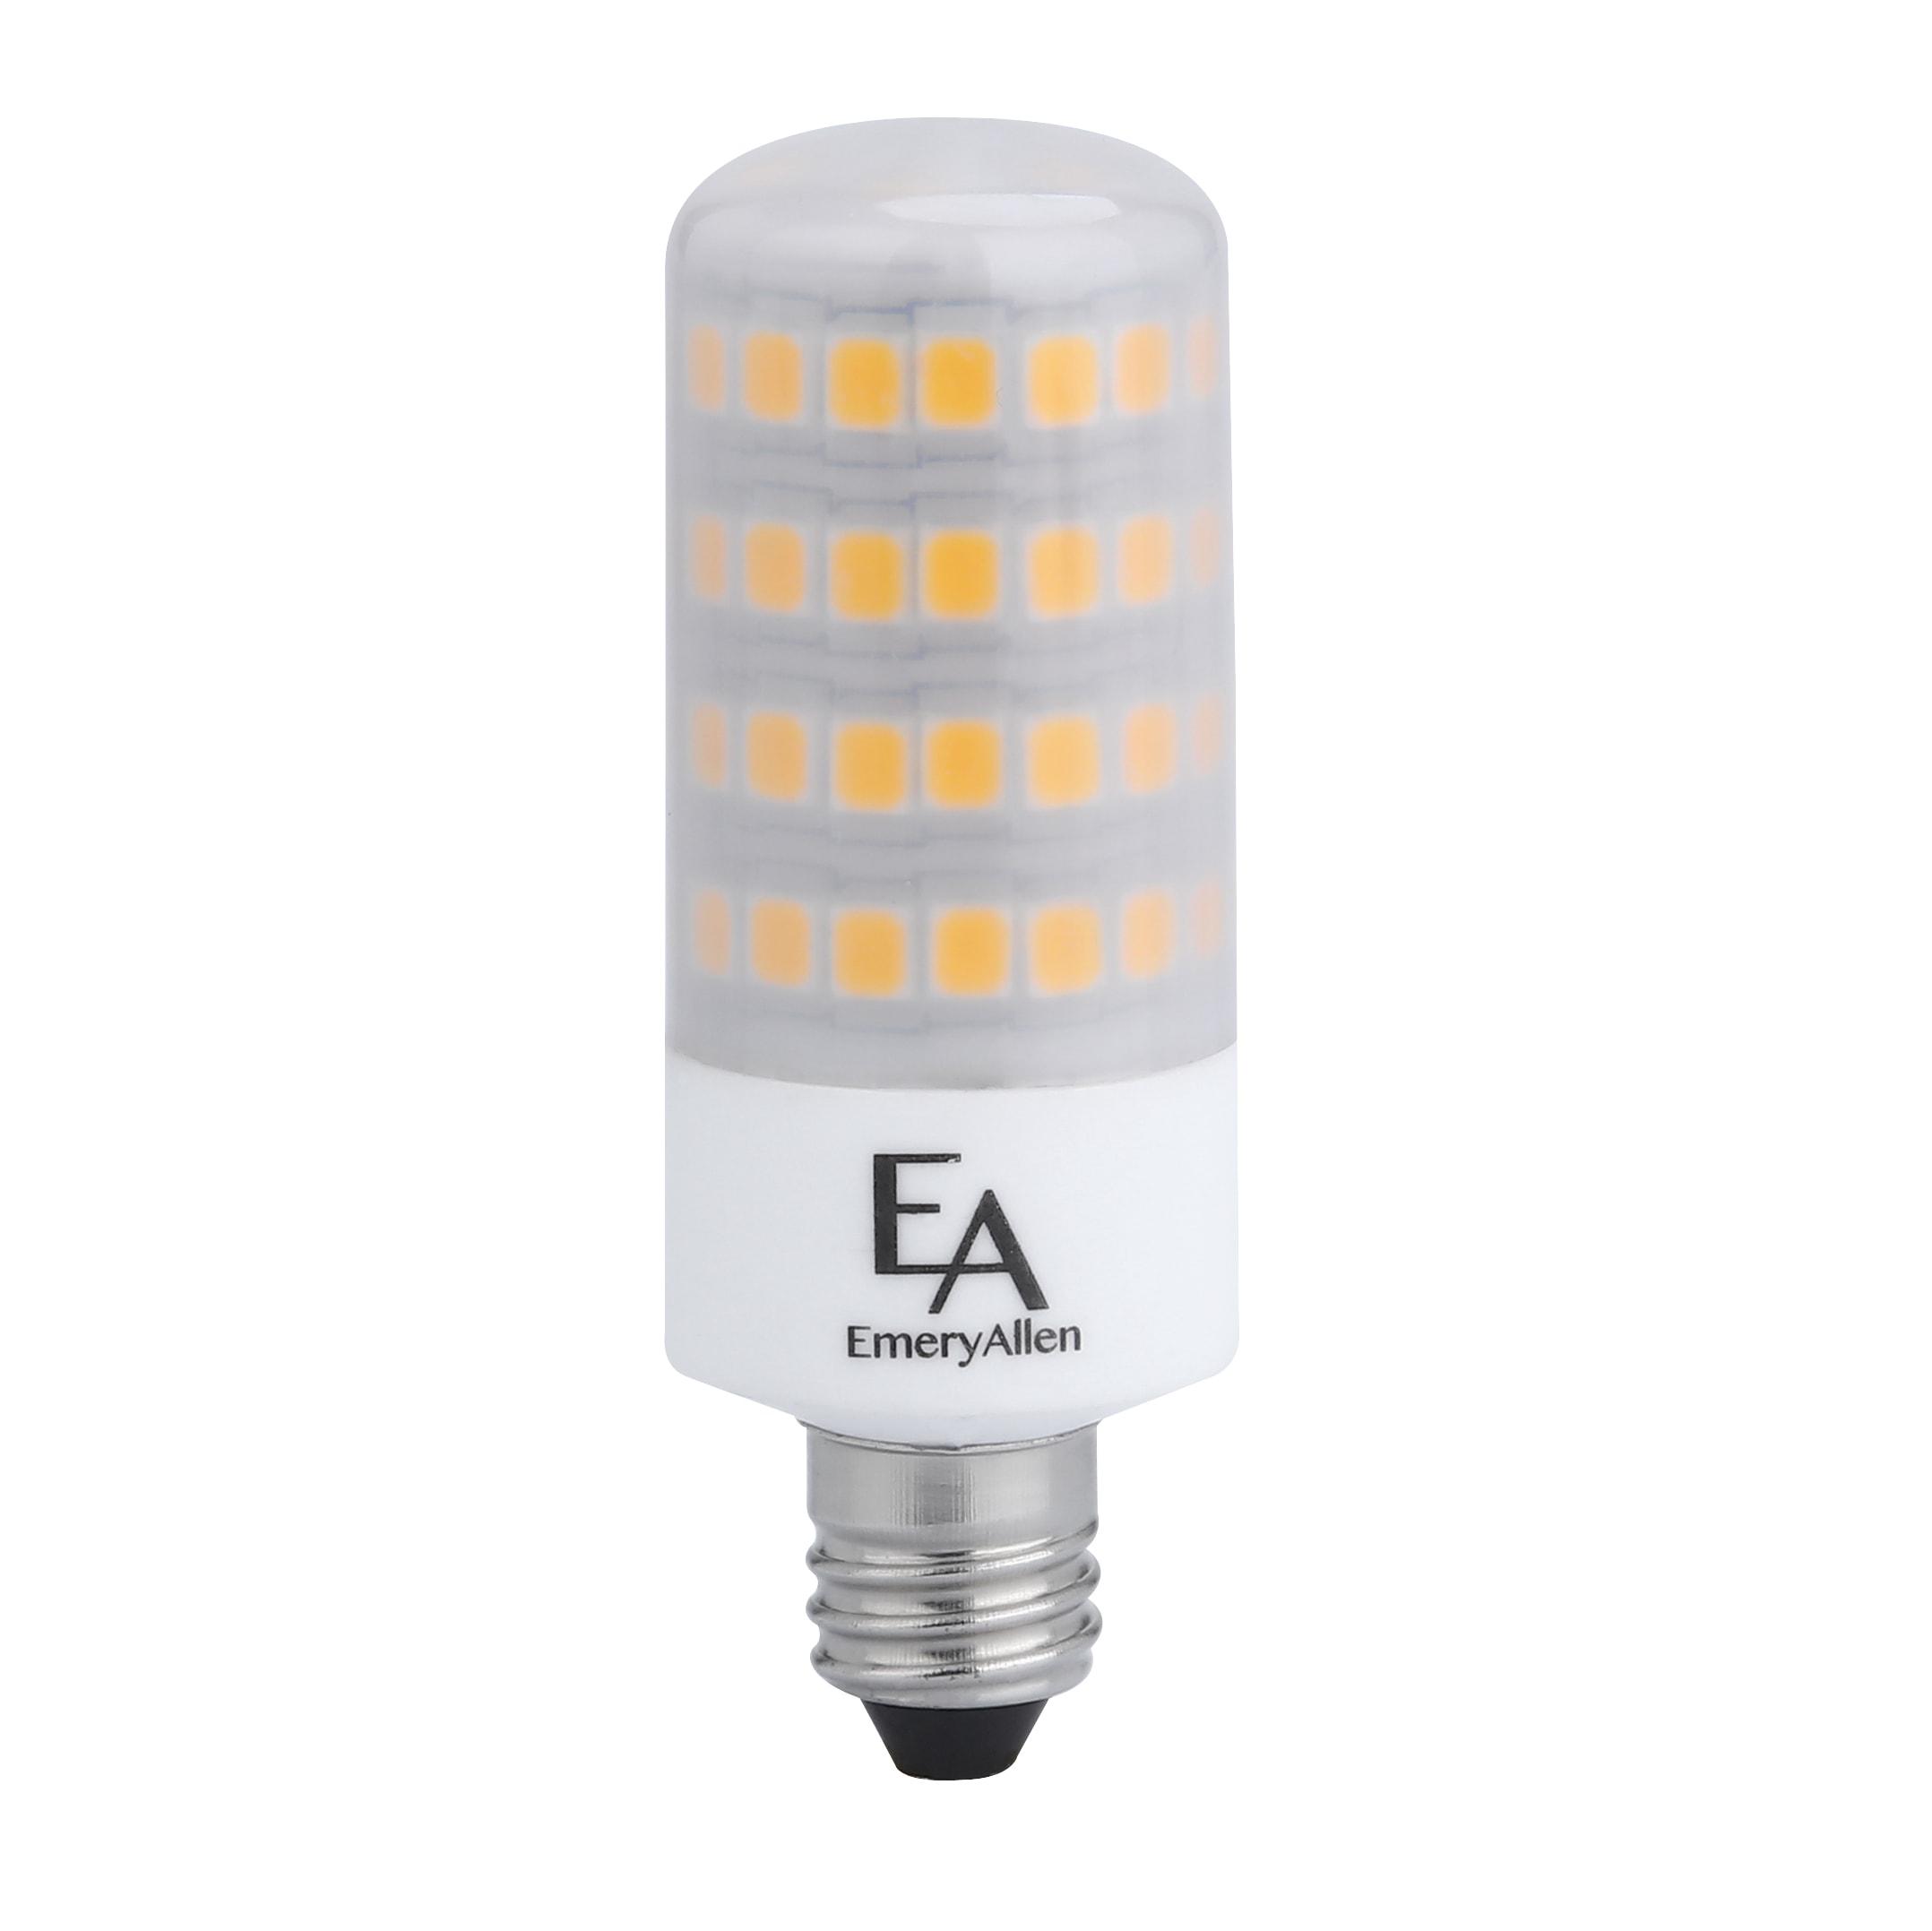 Emeryallen Ea E11 5 0w 001 4090 D 2